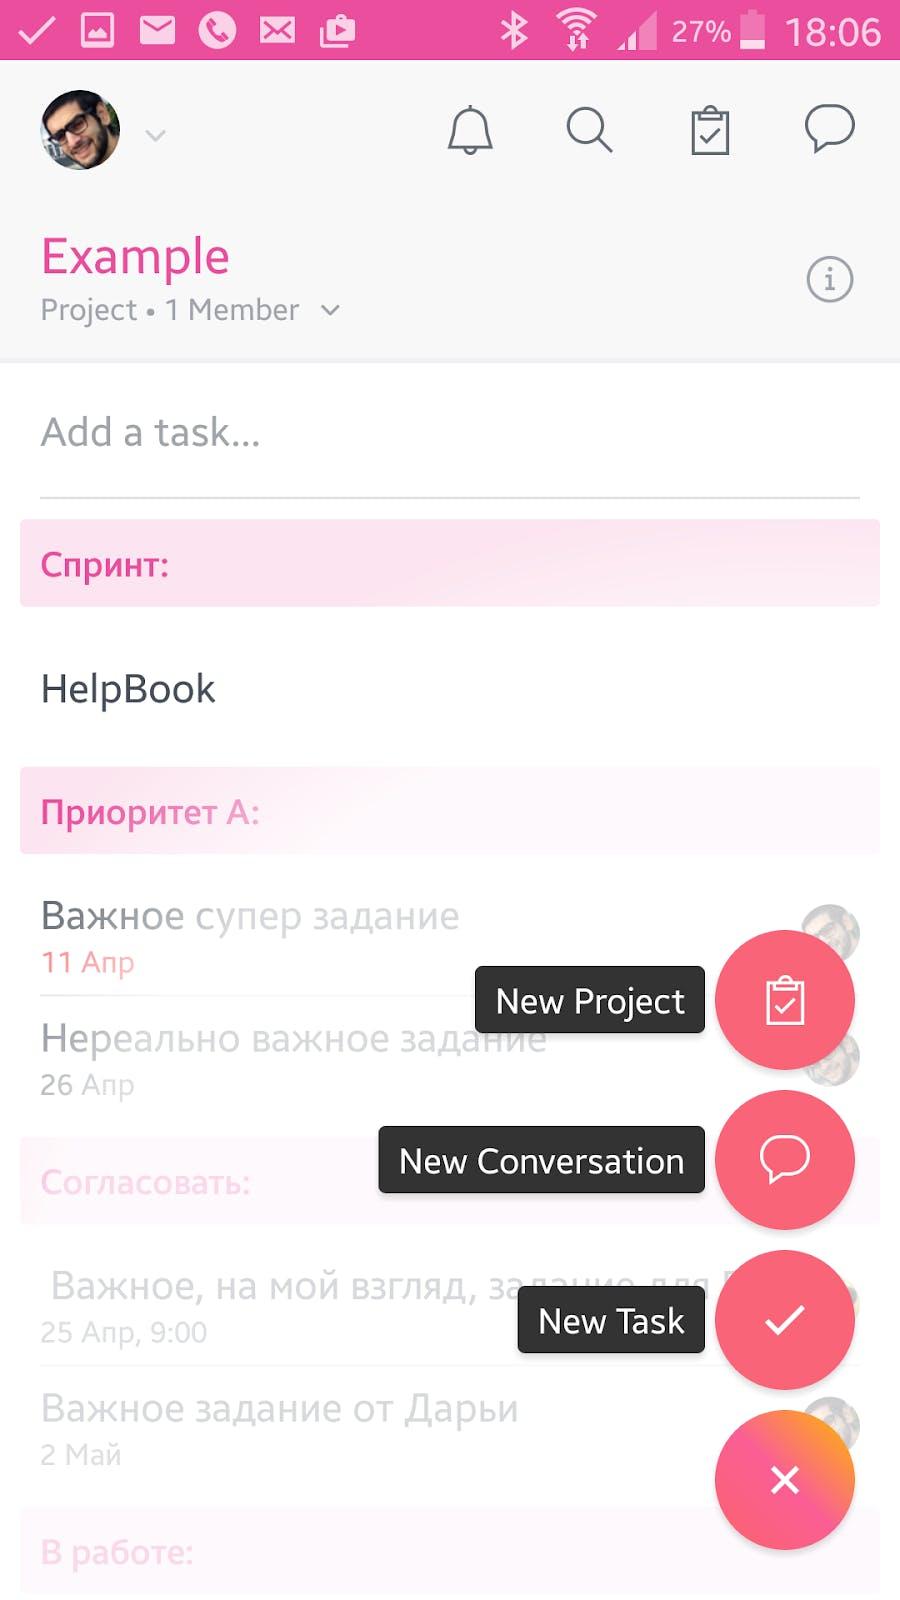 Screenshot_2017-04-13-18-06-09.png